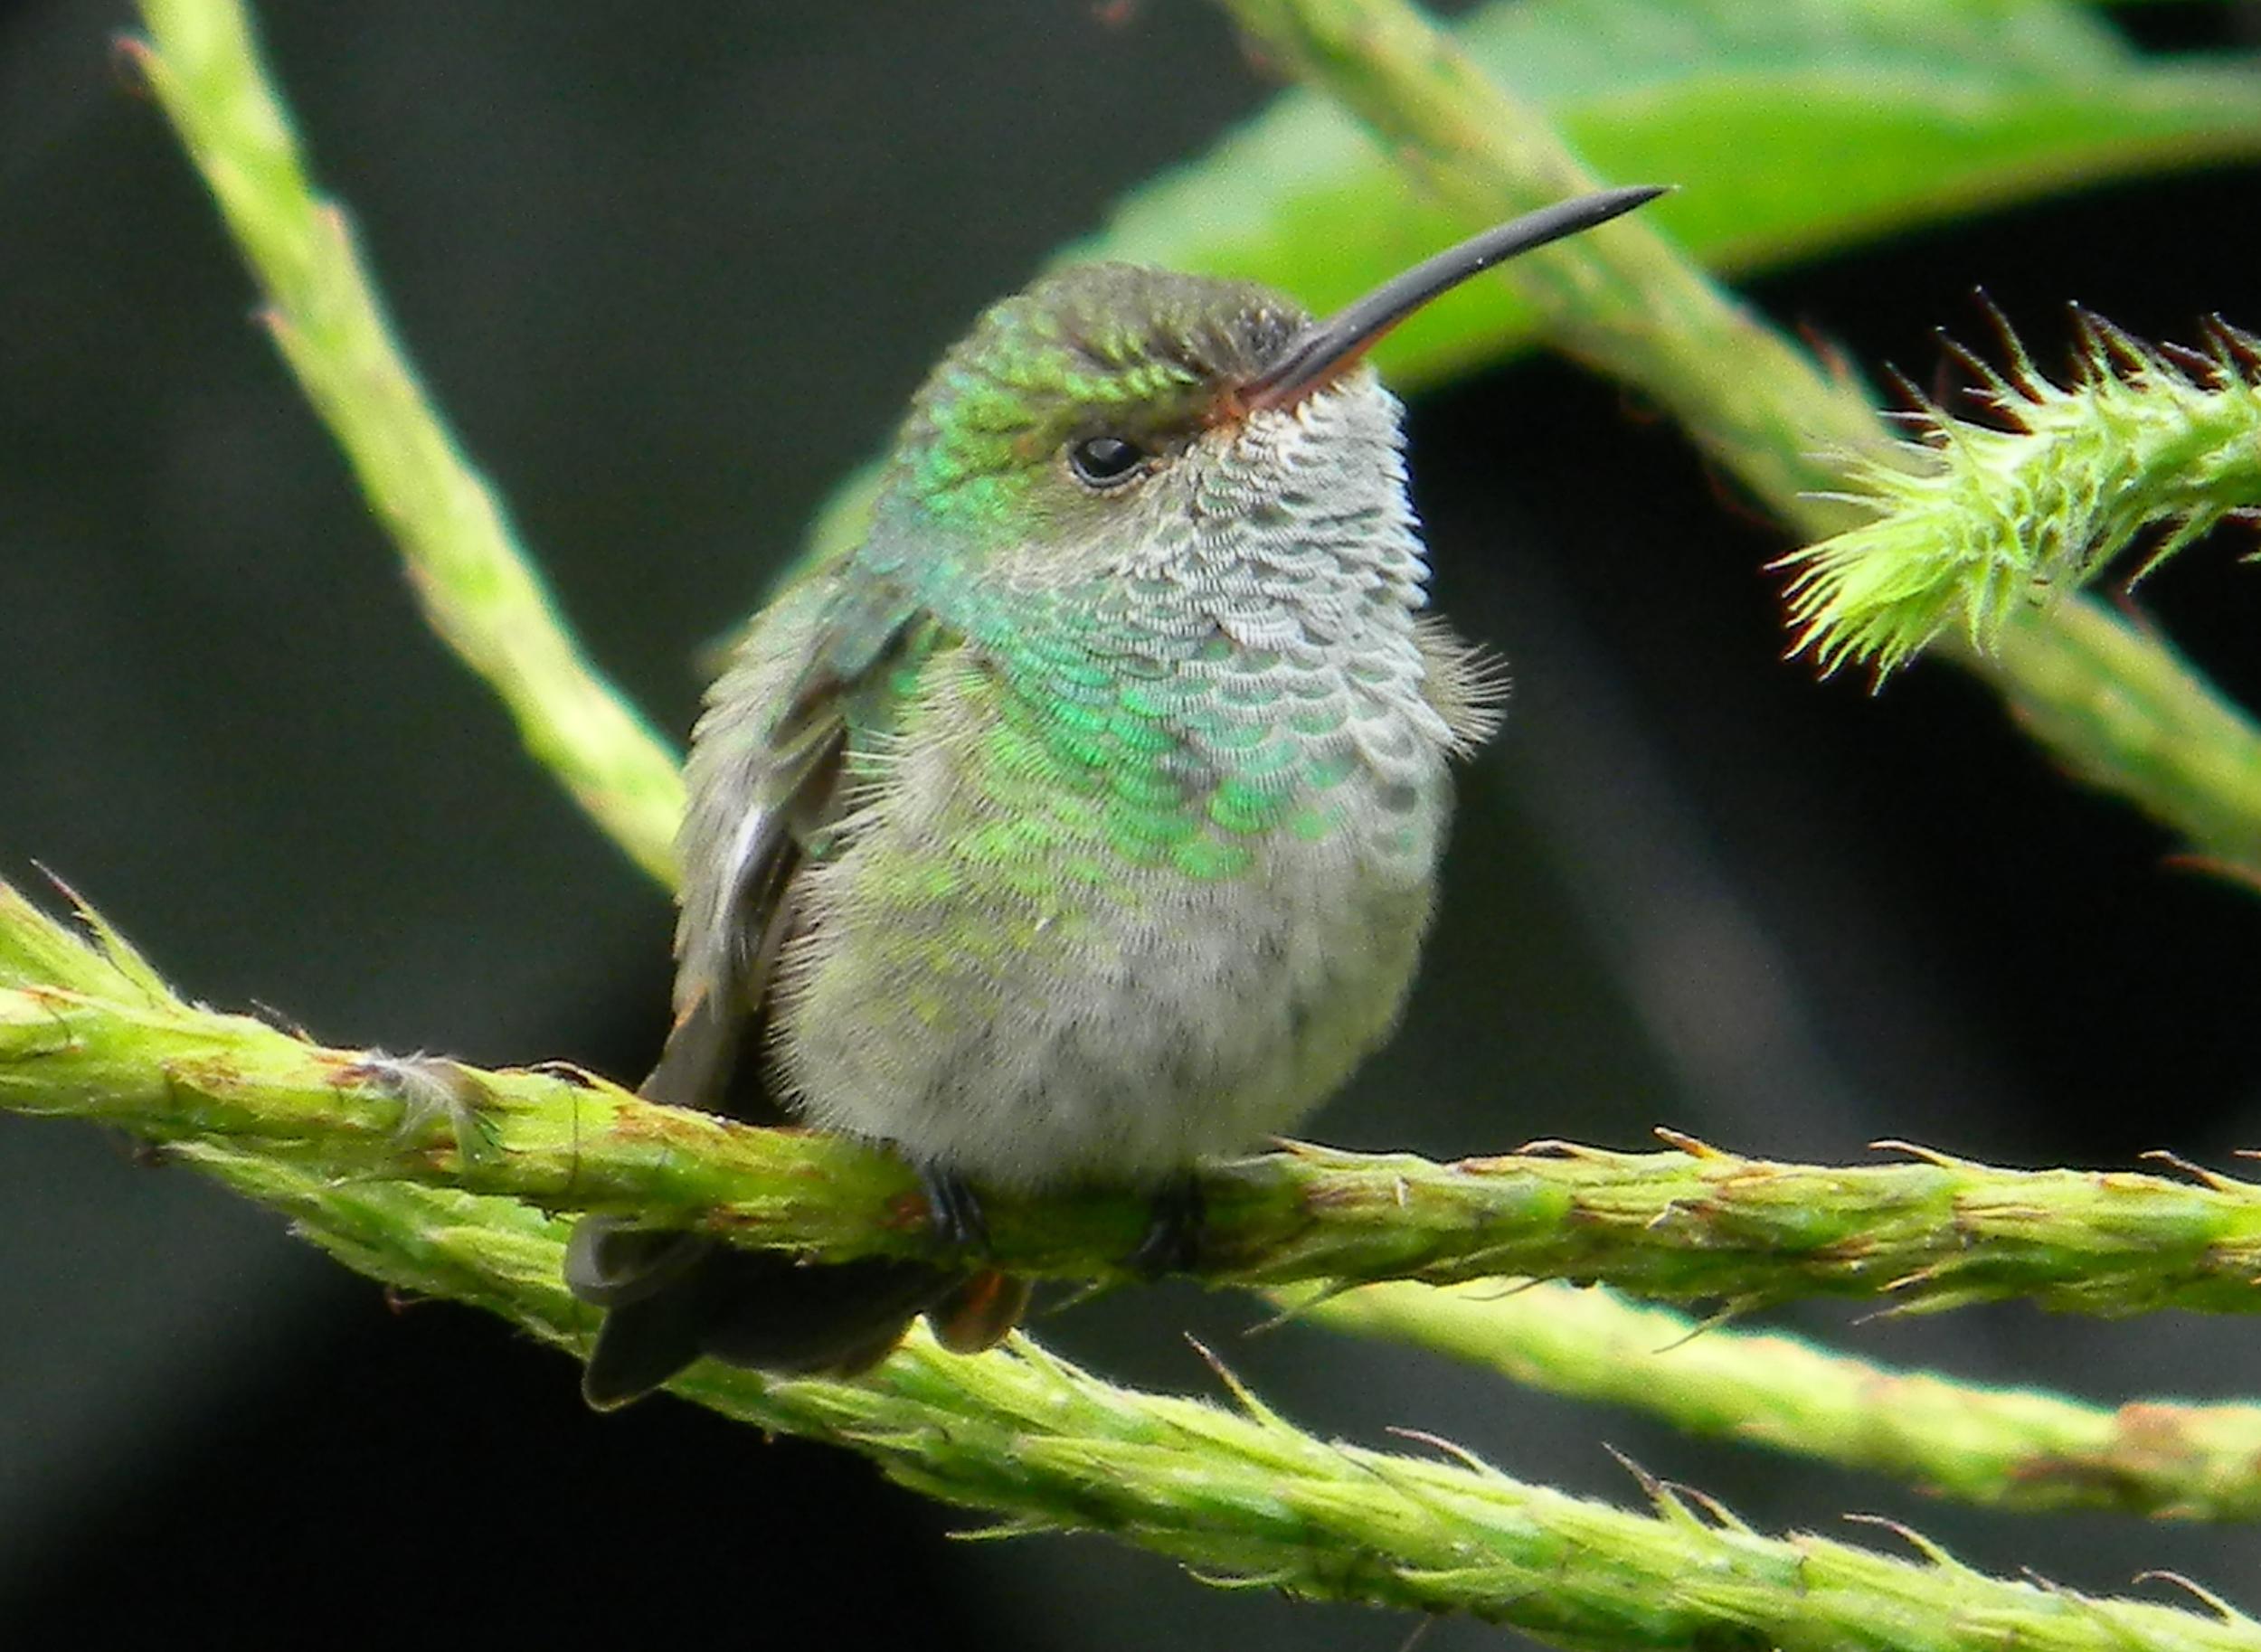 Rufous-tailed.Hummingbird.female.Observatory.7julio2013.JNorris.JPG